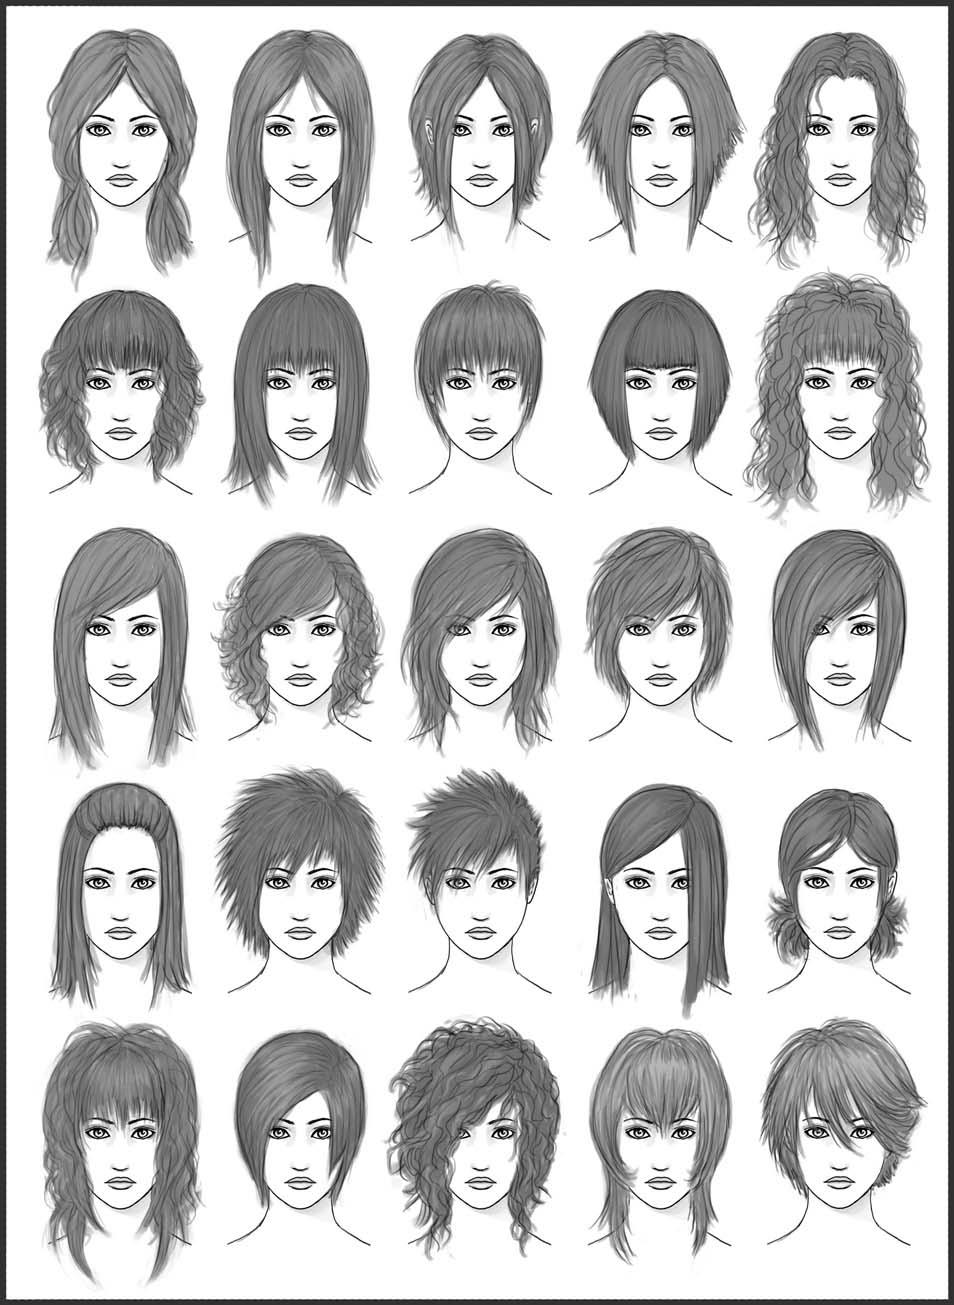 Womens Hair - Set 2 by dark-sheikah on DeviantArt